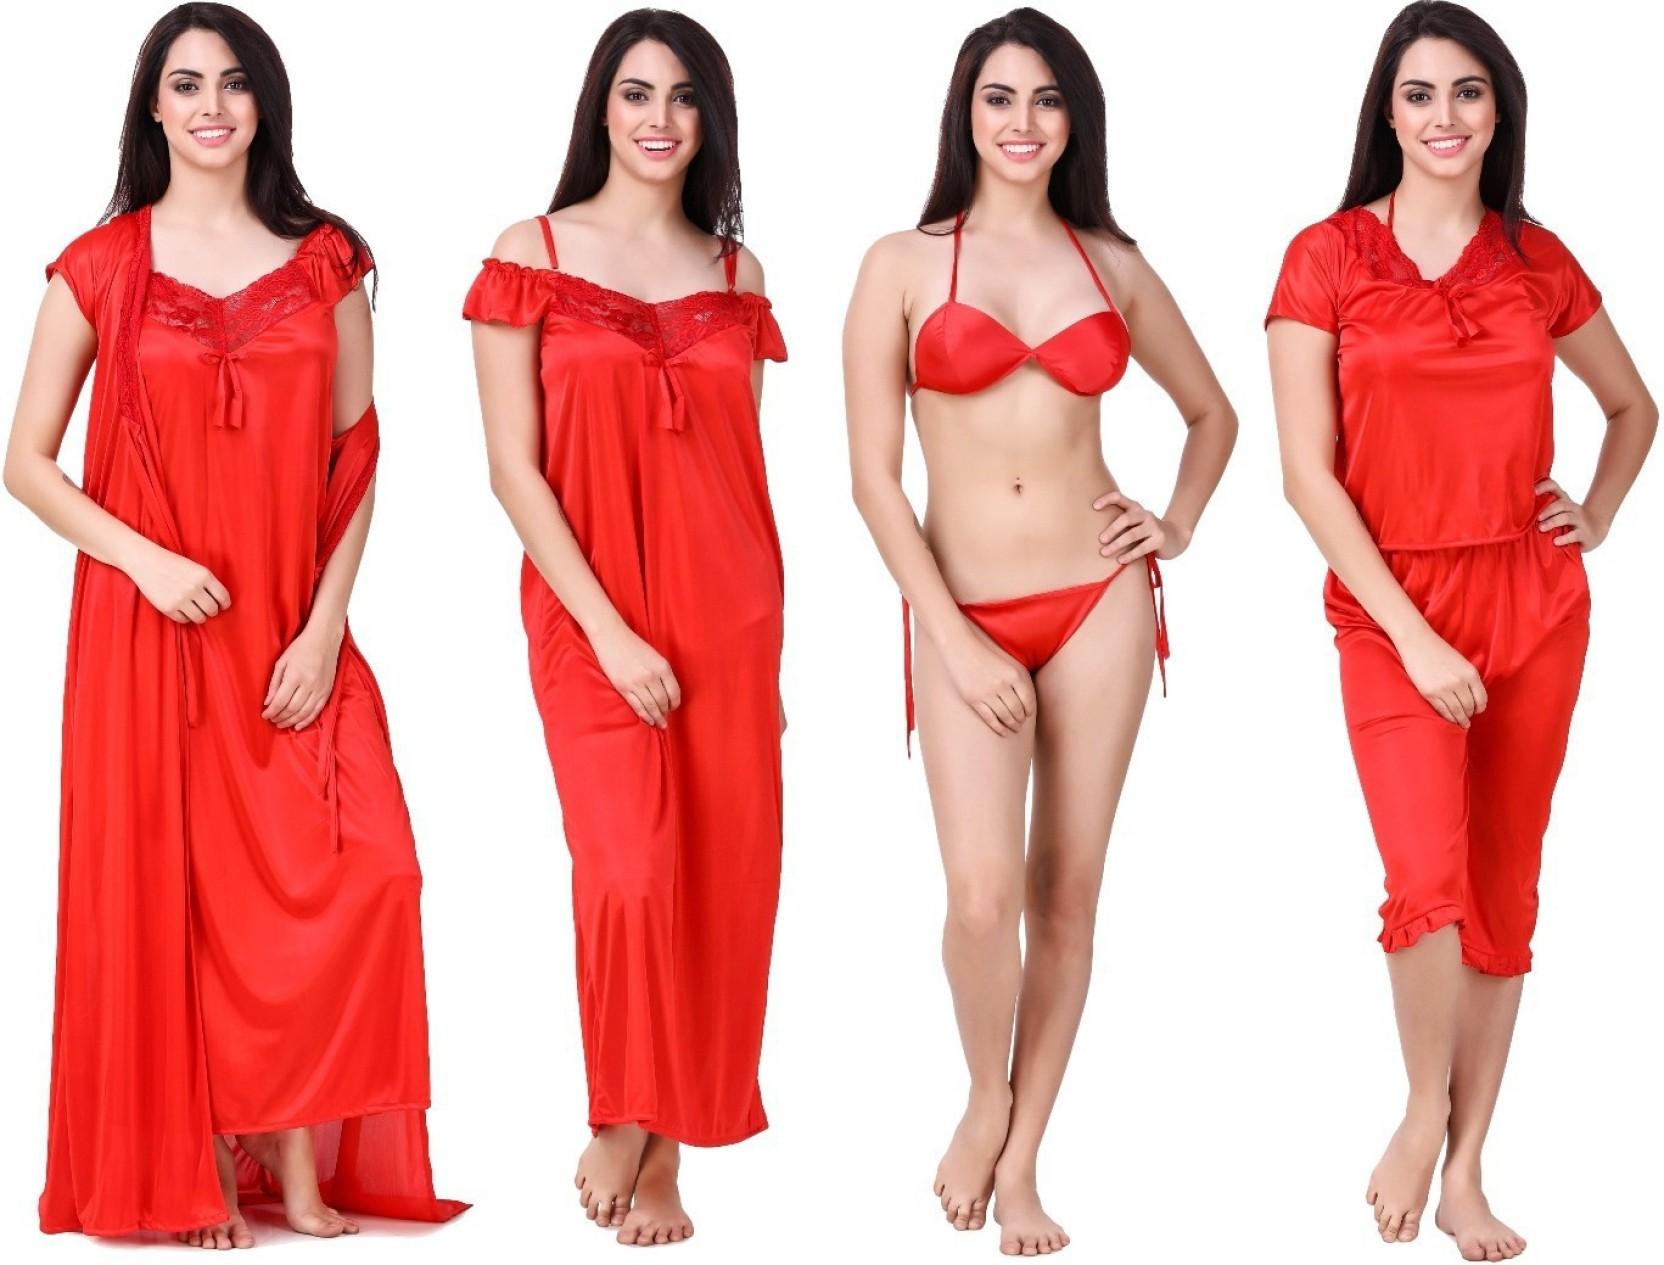 Keoti Women Nighty with Robe - Buy Keoti Women Nighty with Robe ... 78b5a418e